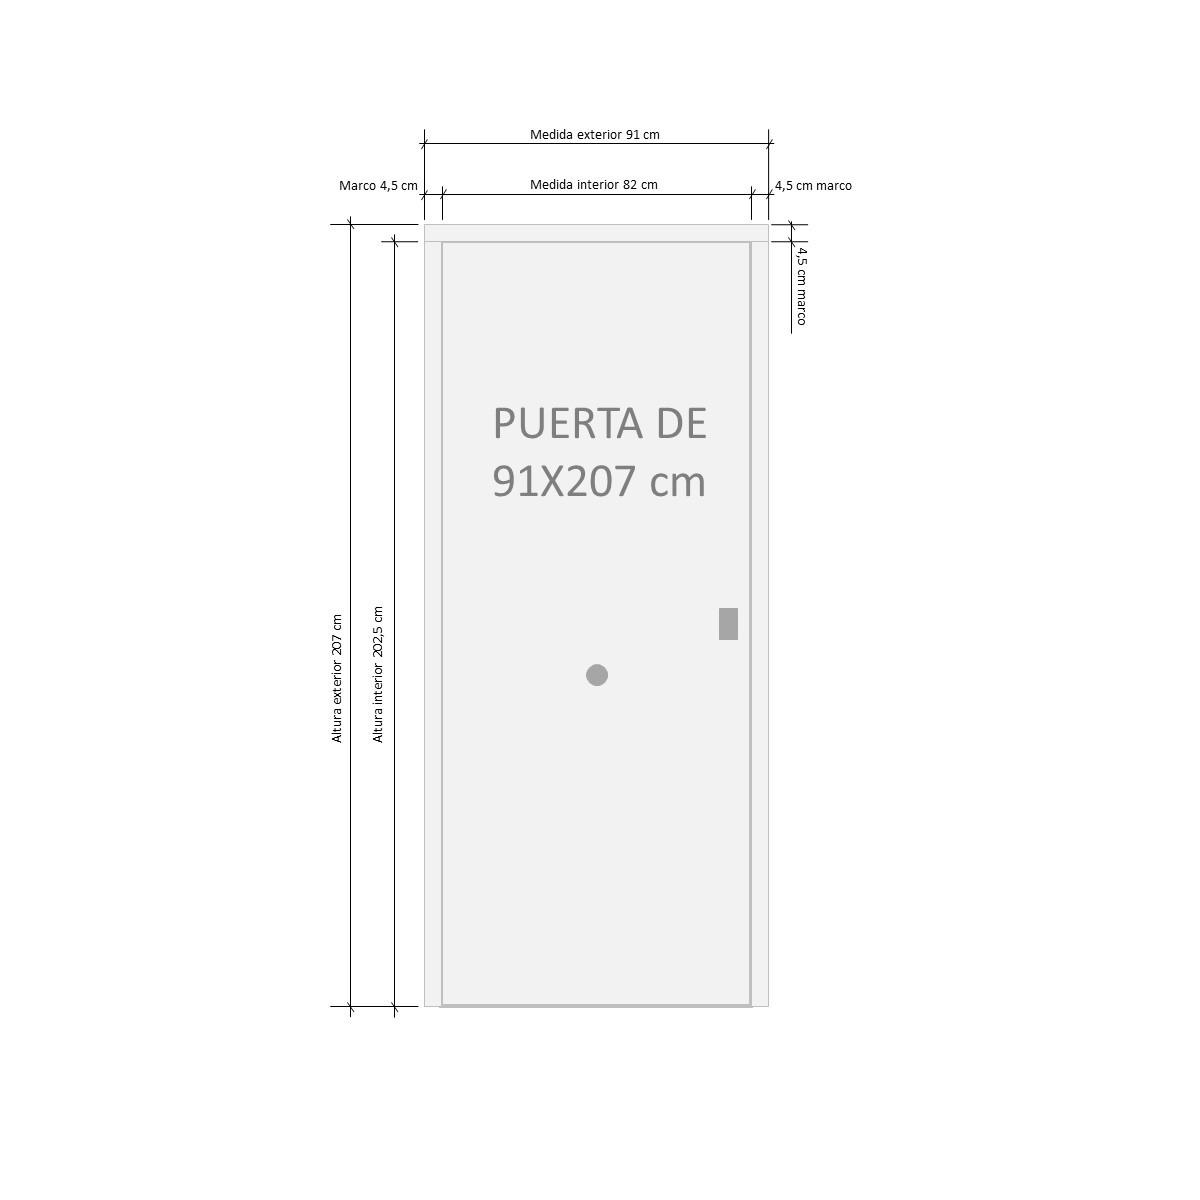 Puerta acorazada Antique Puertas acorazadas Serie B4-BL Cearco